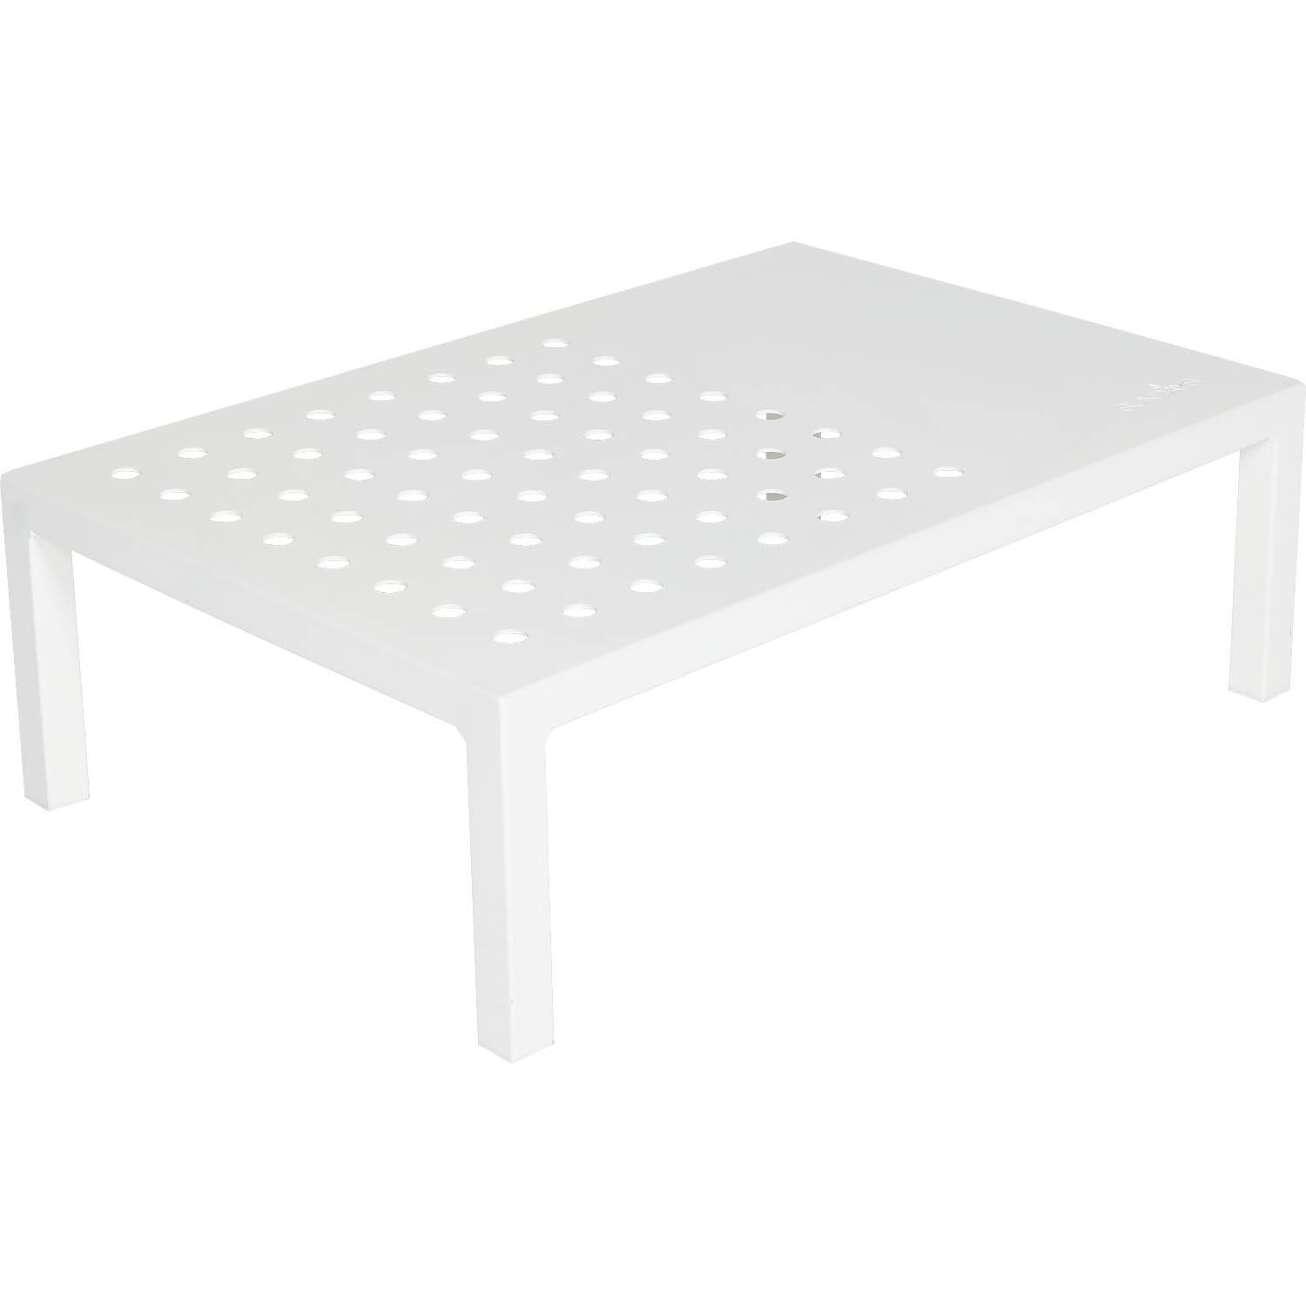 Sundays Frame firkantet sofabord i hvit aluminium lakkert med Jotun pulverlakk